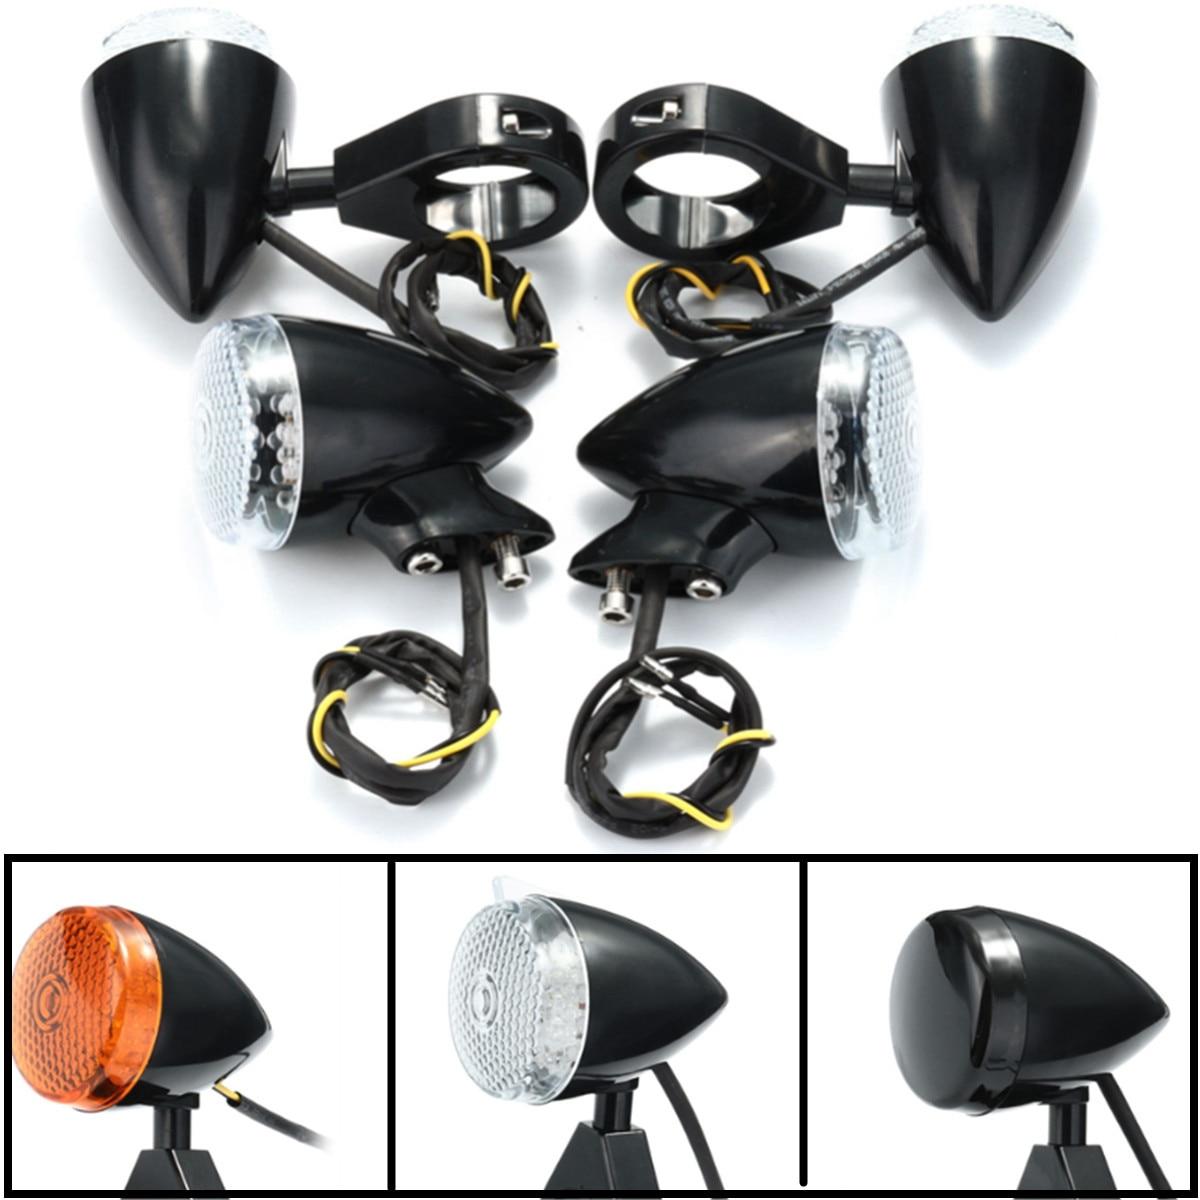 4pcs Motorcycle LED Turn Signal Light Indicator Lamps Front Rear 41mm Fork Clamp For Harley Davidson Cafe Racer